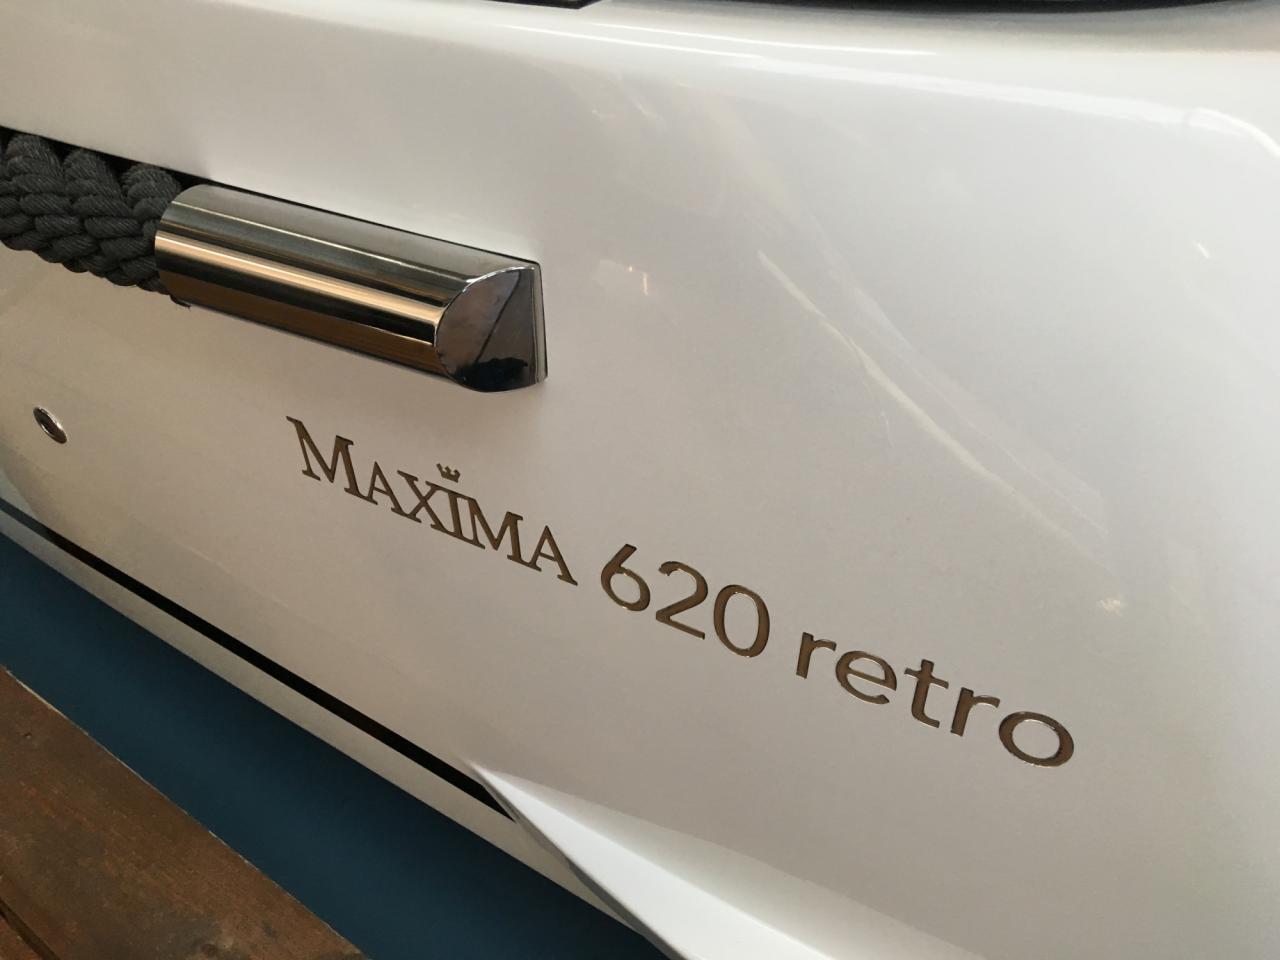 Maxima 620 Retro 29